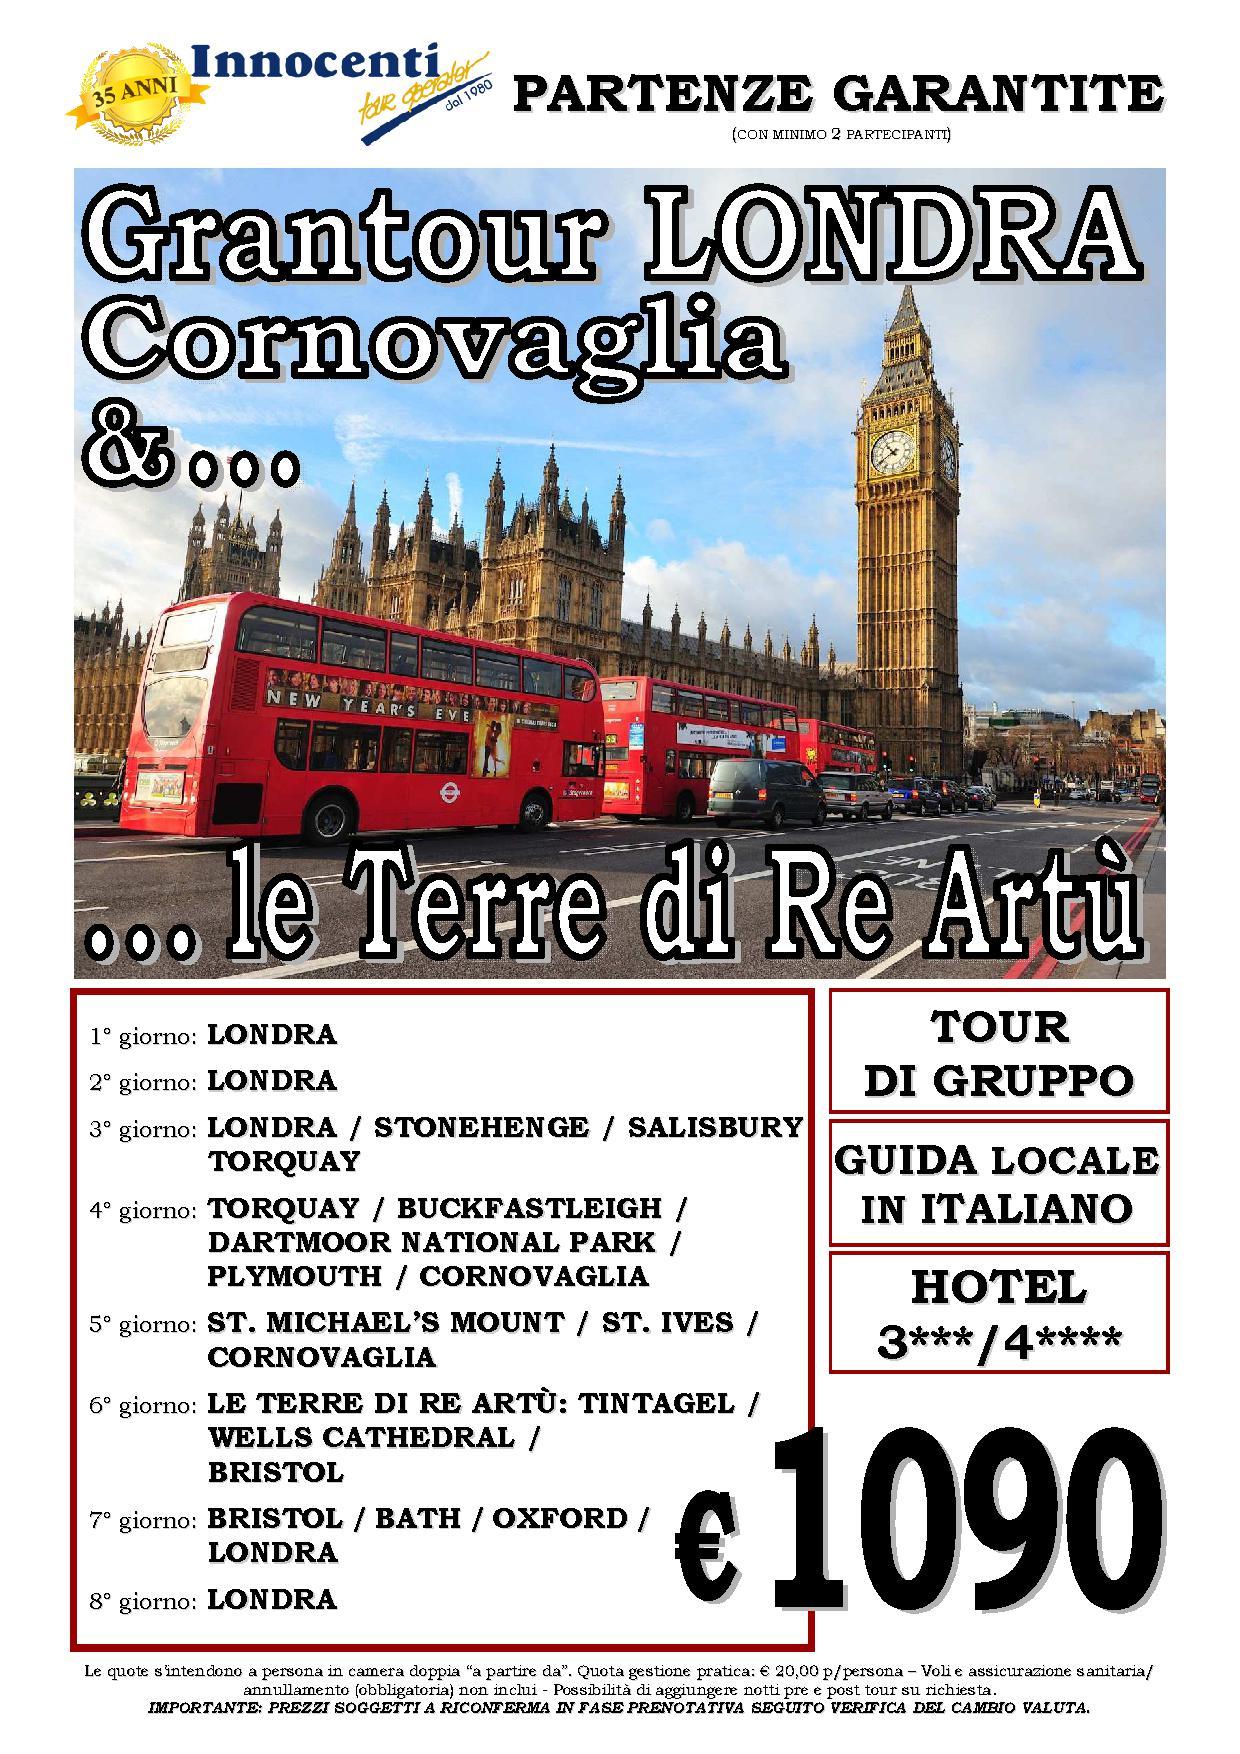 GRAN TOUR LONDRA